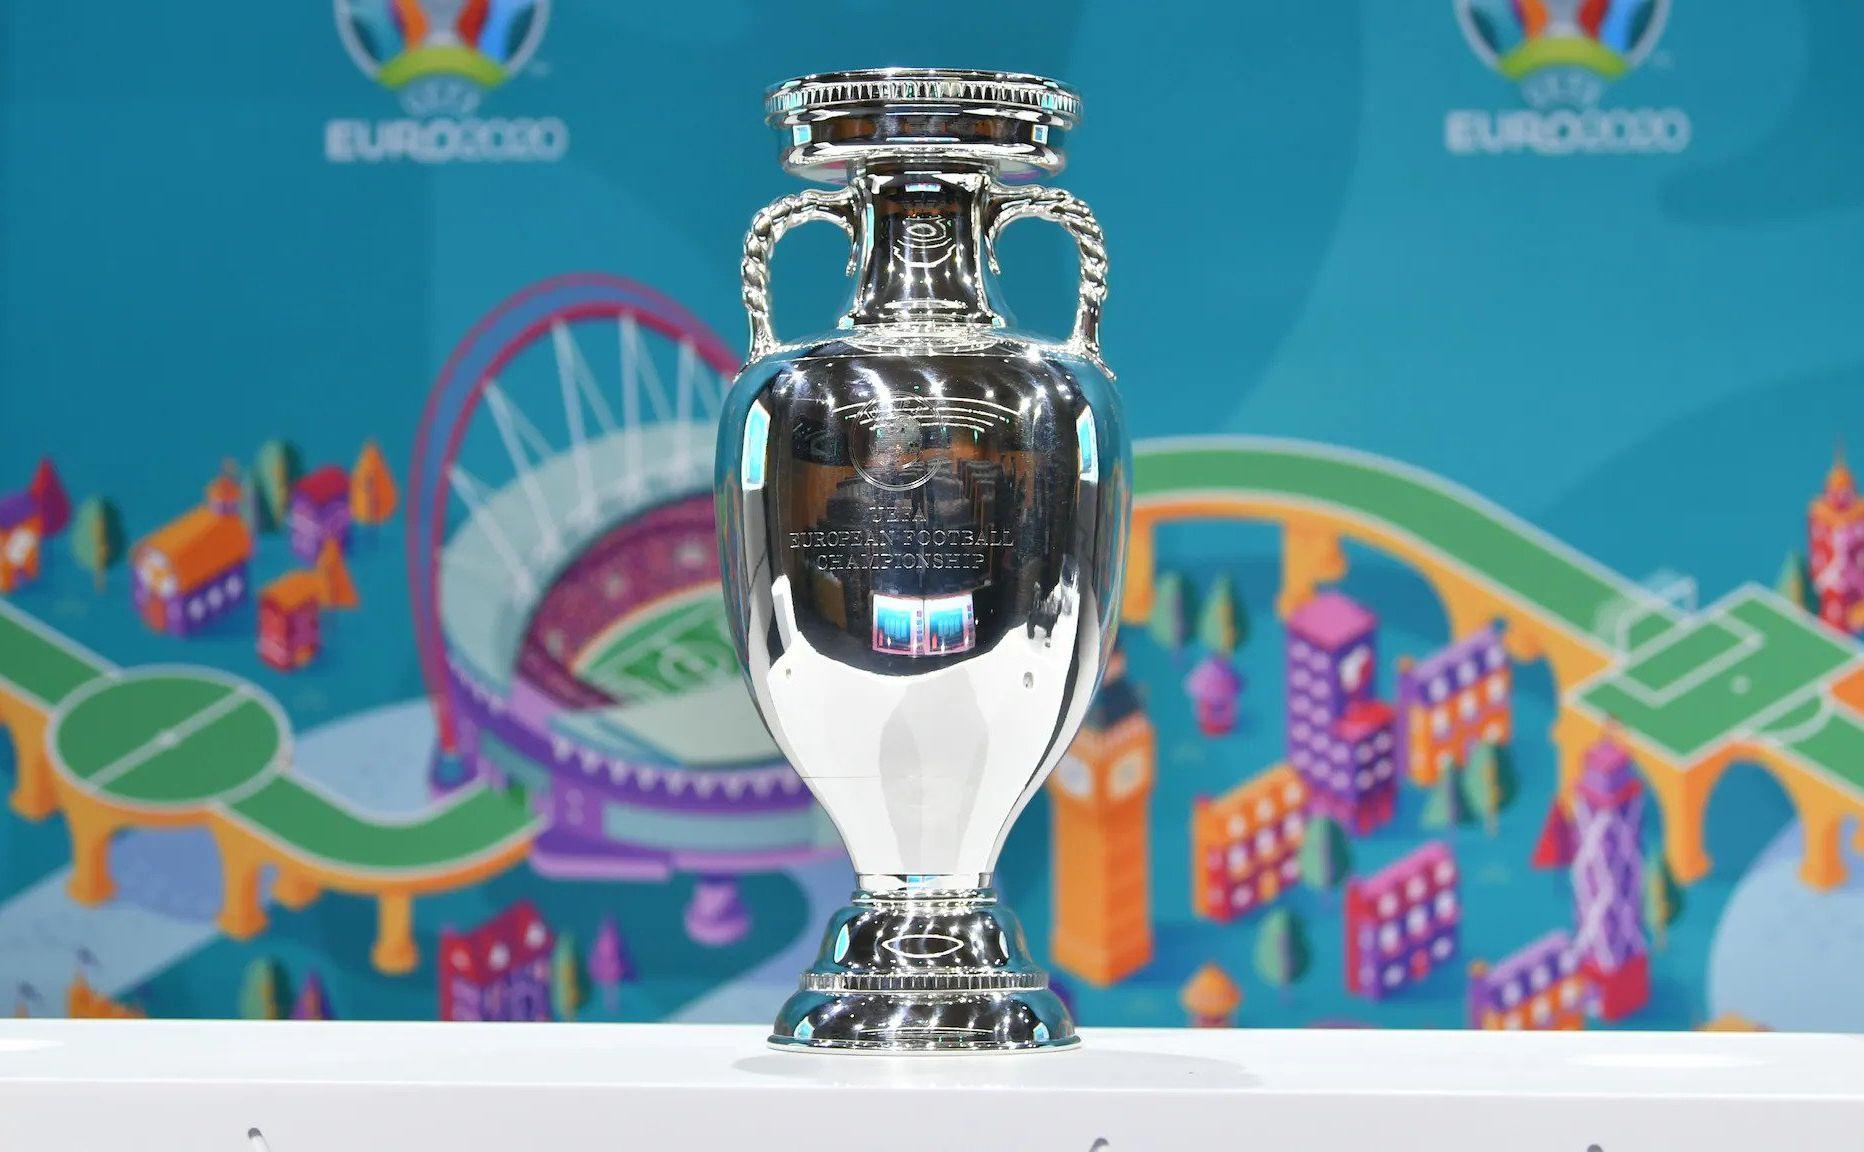 Budapest Euro 2020 יורו 2020 בבודפשט